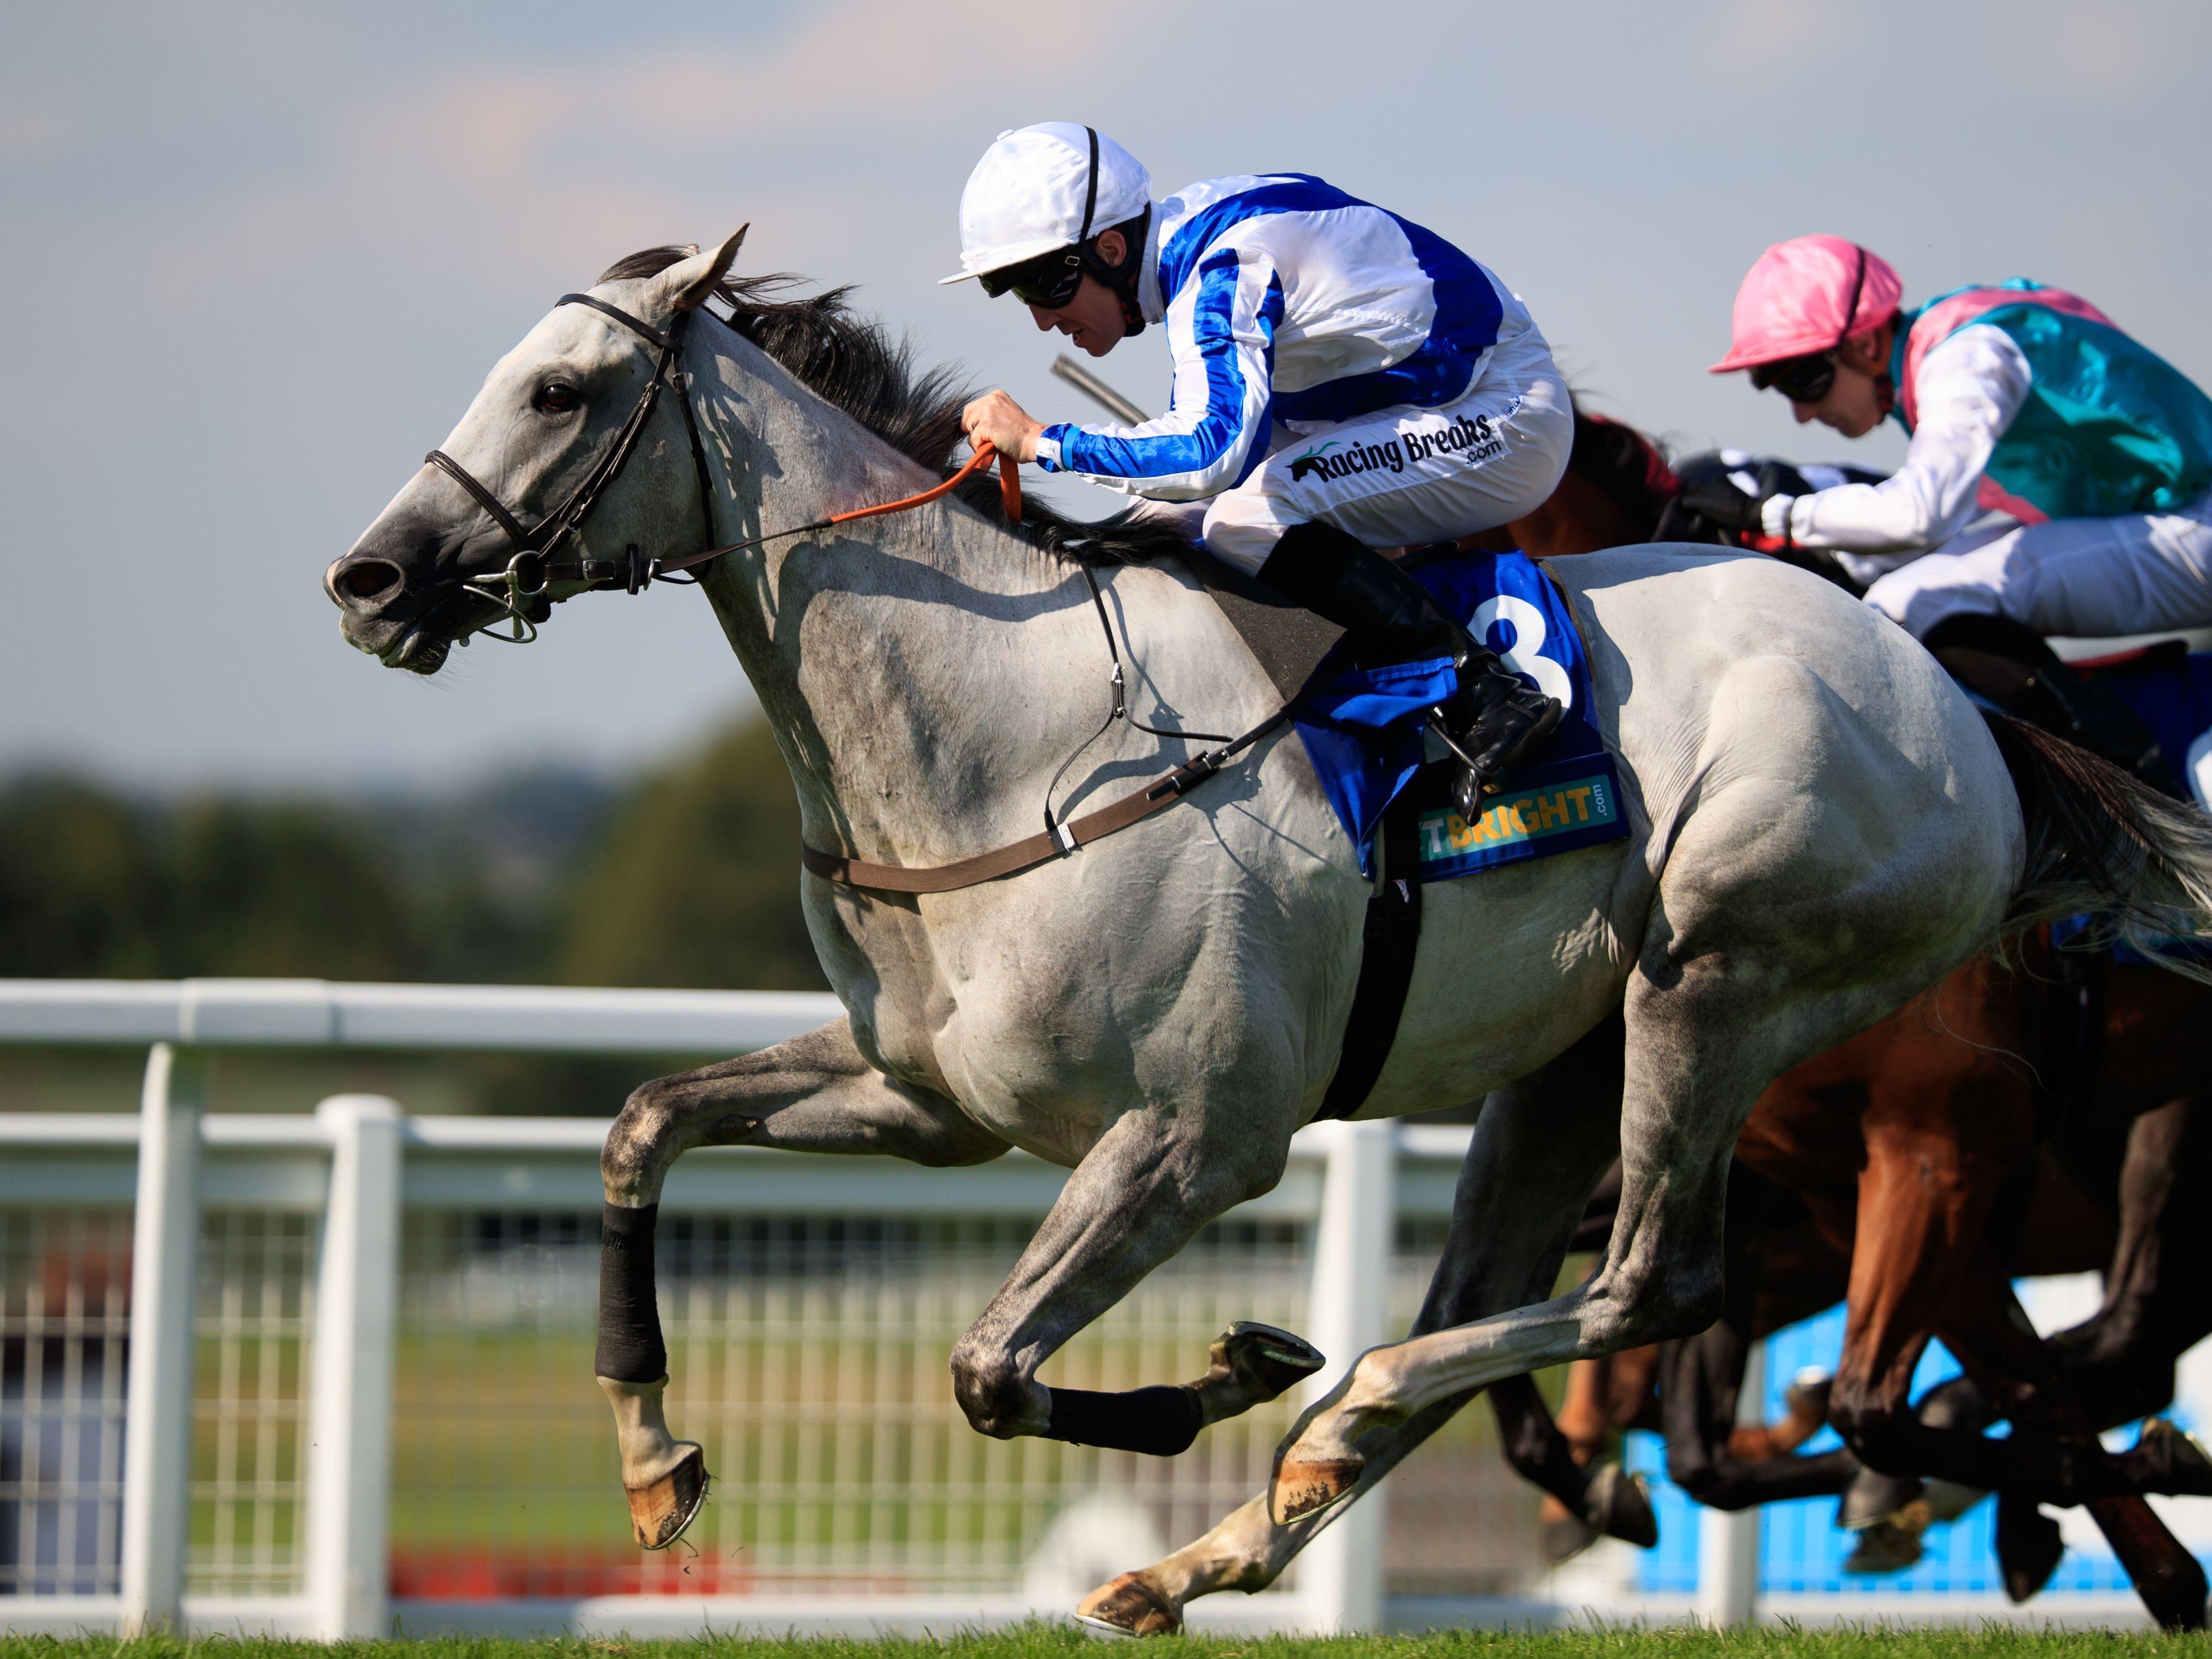 Thundering Blue will bid to repeat his Juddmonte International heroics next week (John Walton/PA)